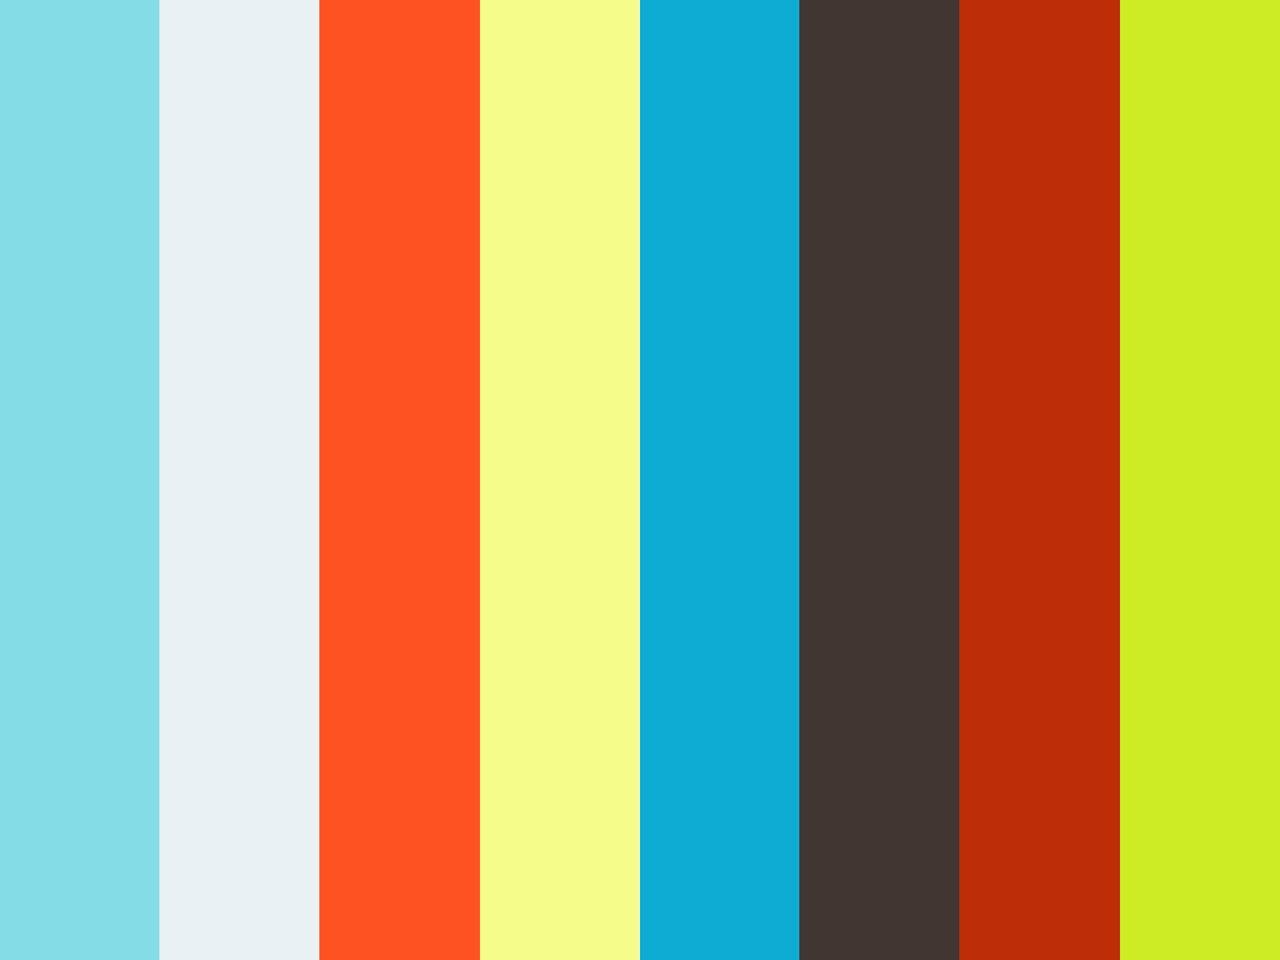 Bluecrux - Binocs User Meeting - Aftermovie